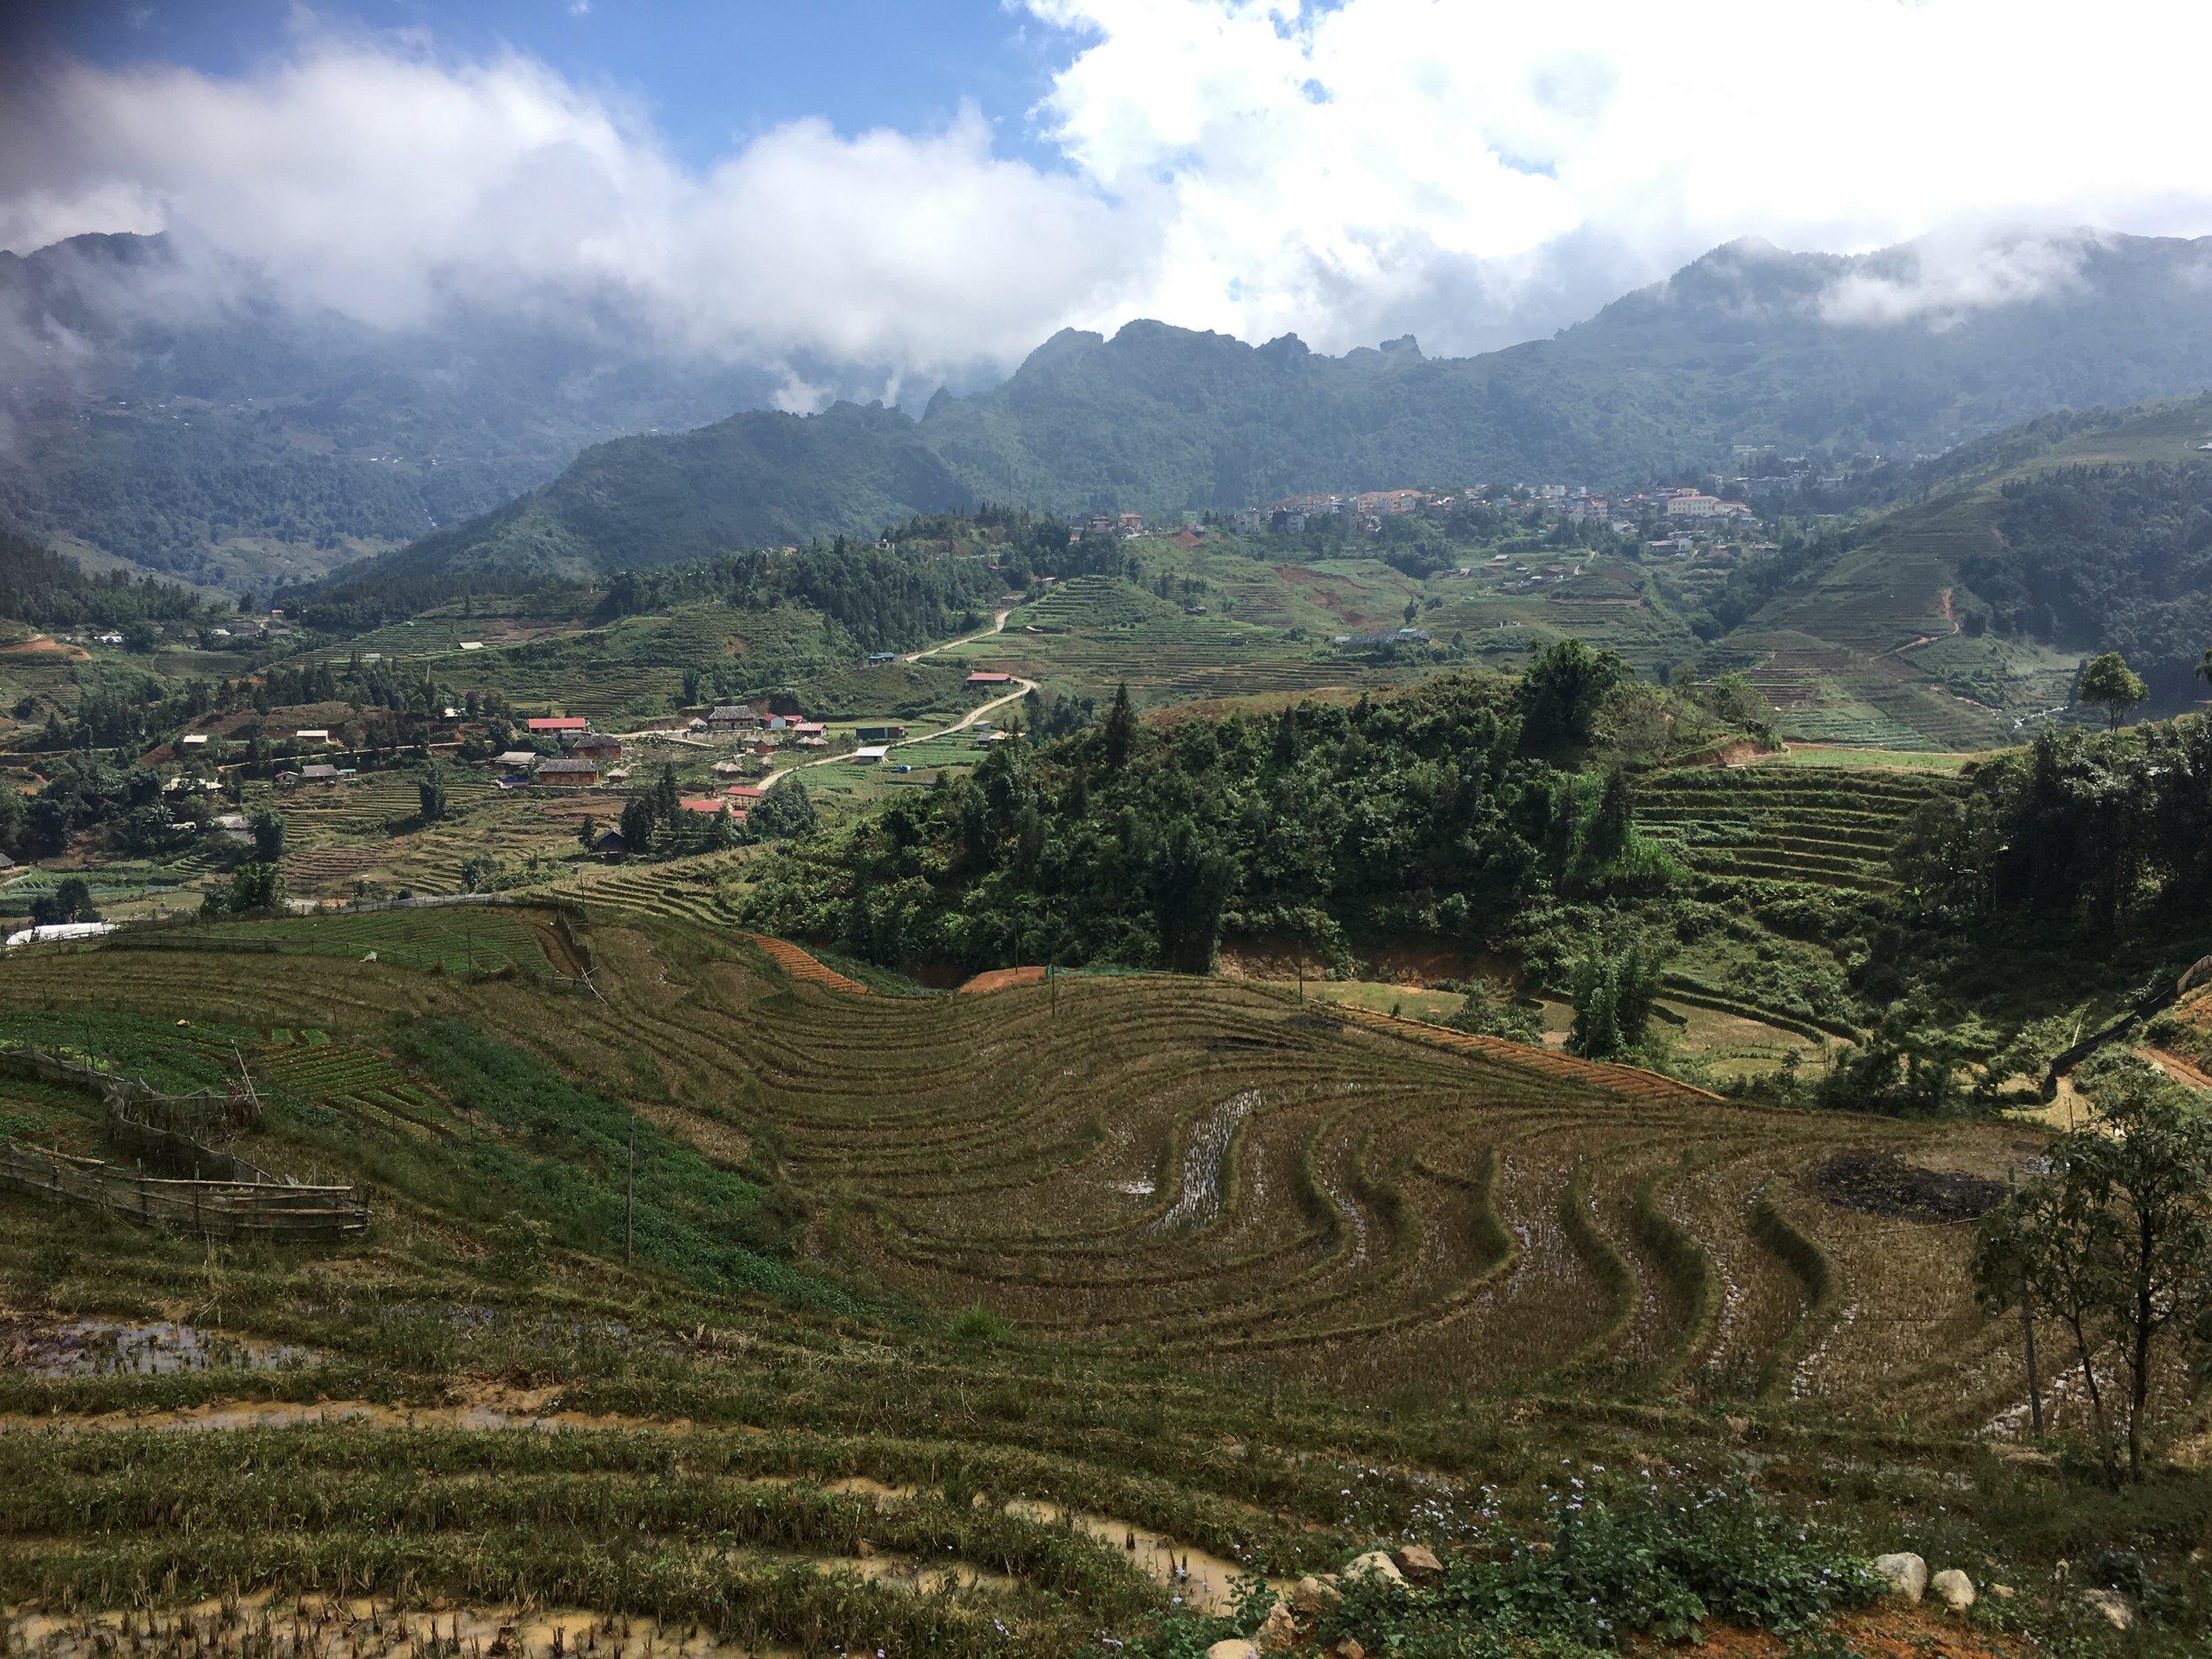 Terraced rice fields around Sapa